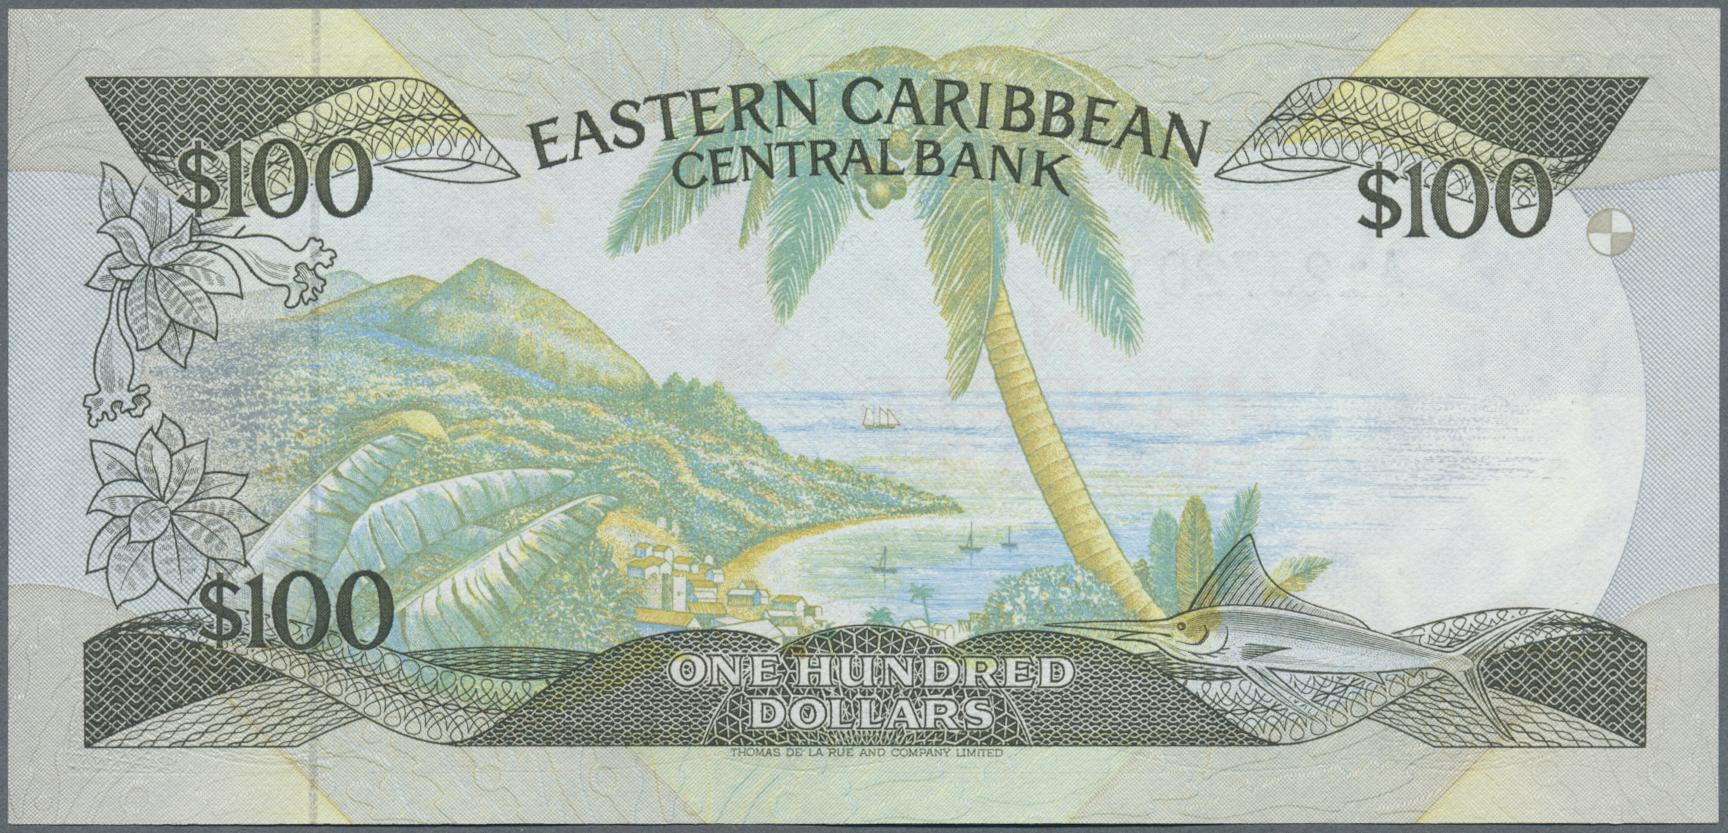 Lot 38 - Anguilla | Banknoten  -  Auktionshaus Christoph Gärtner GmbH & Co. KG Banknotes Worldwide Auction #39 Day 1